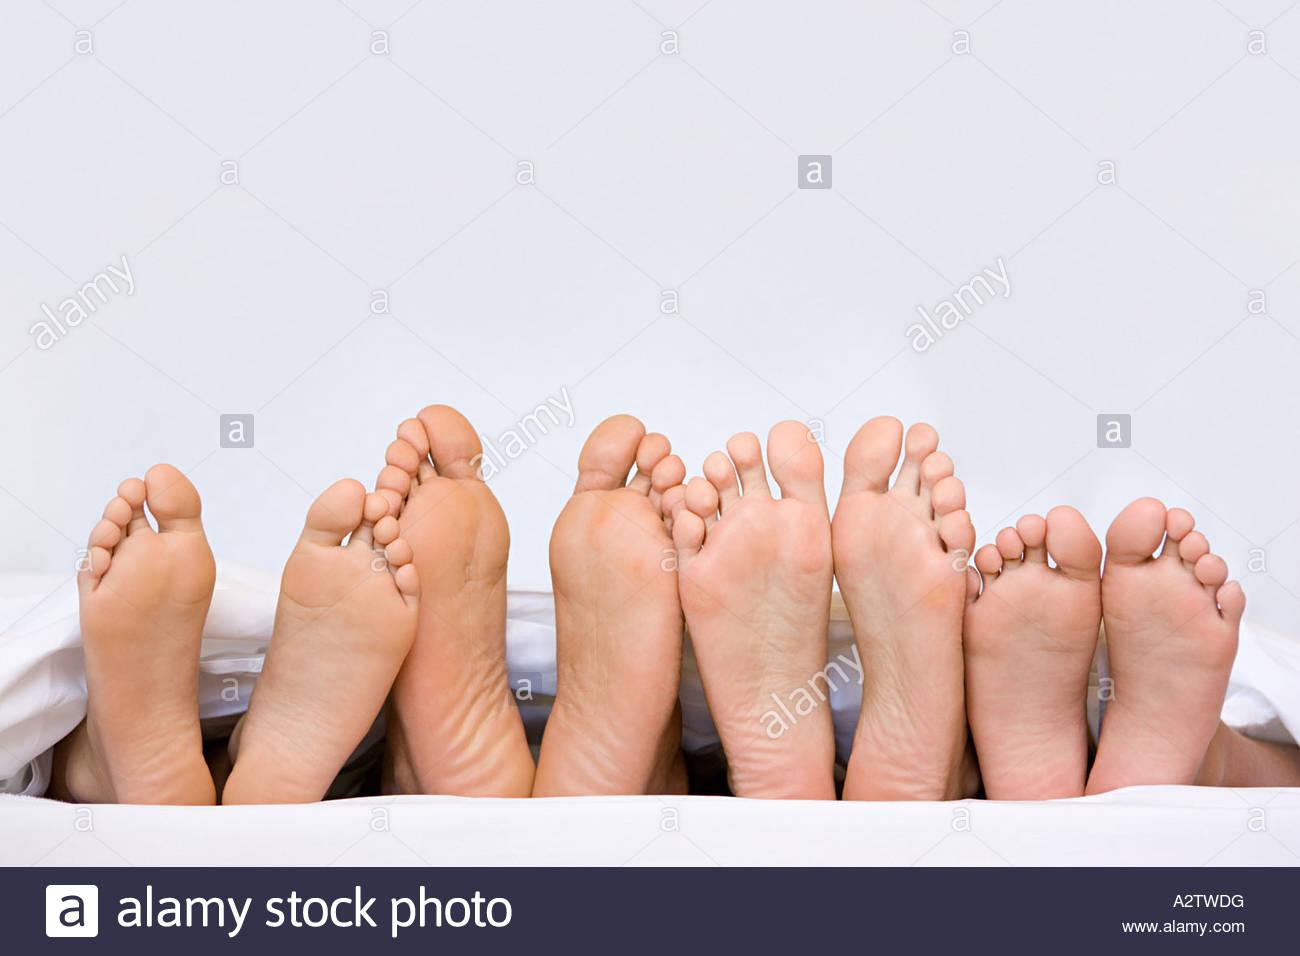 A row of bare feet Stock Photo